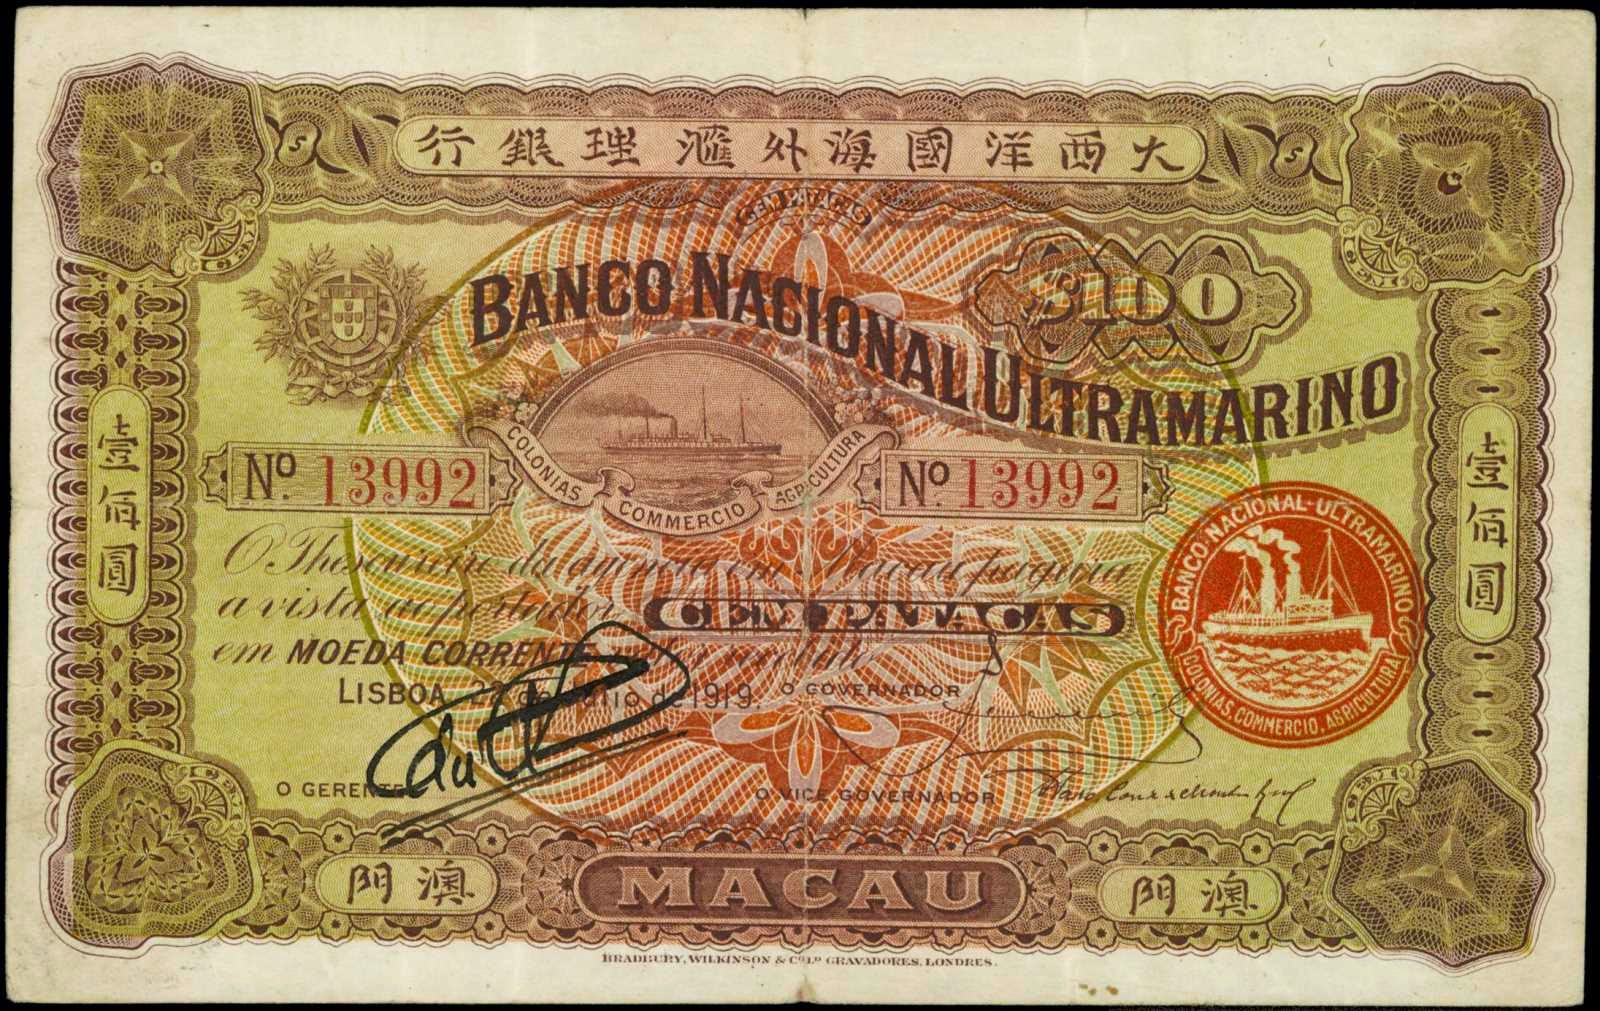 Macao banknotes 100 Patacas Banco Nacional Ultramarino